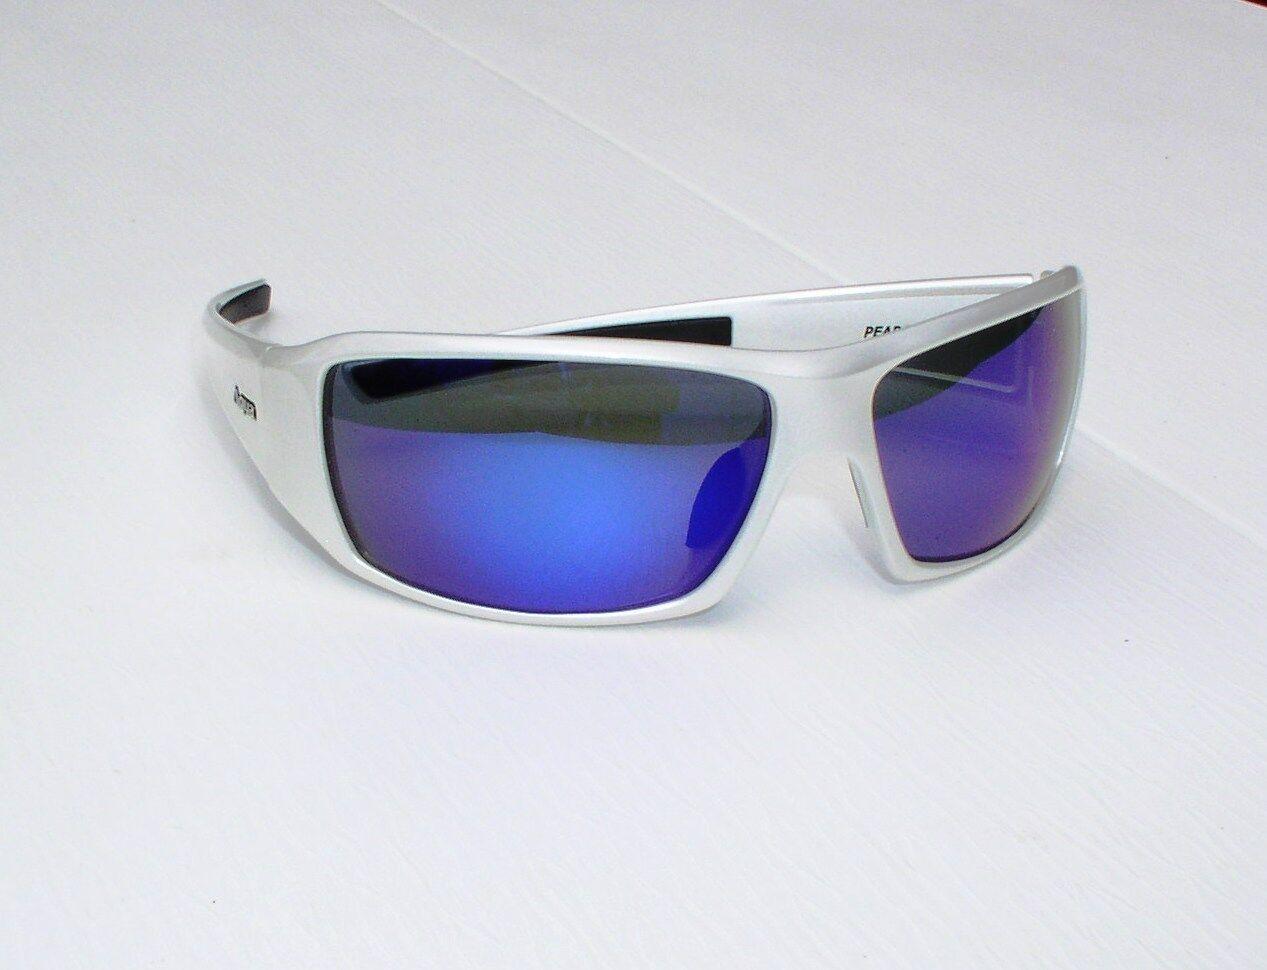 Aqua Polarisationsbrille PERCH in Pearl Weiß, Glasfarbe blau, Sonnenbrille